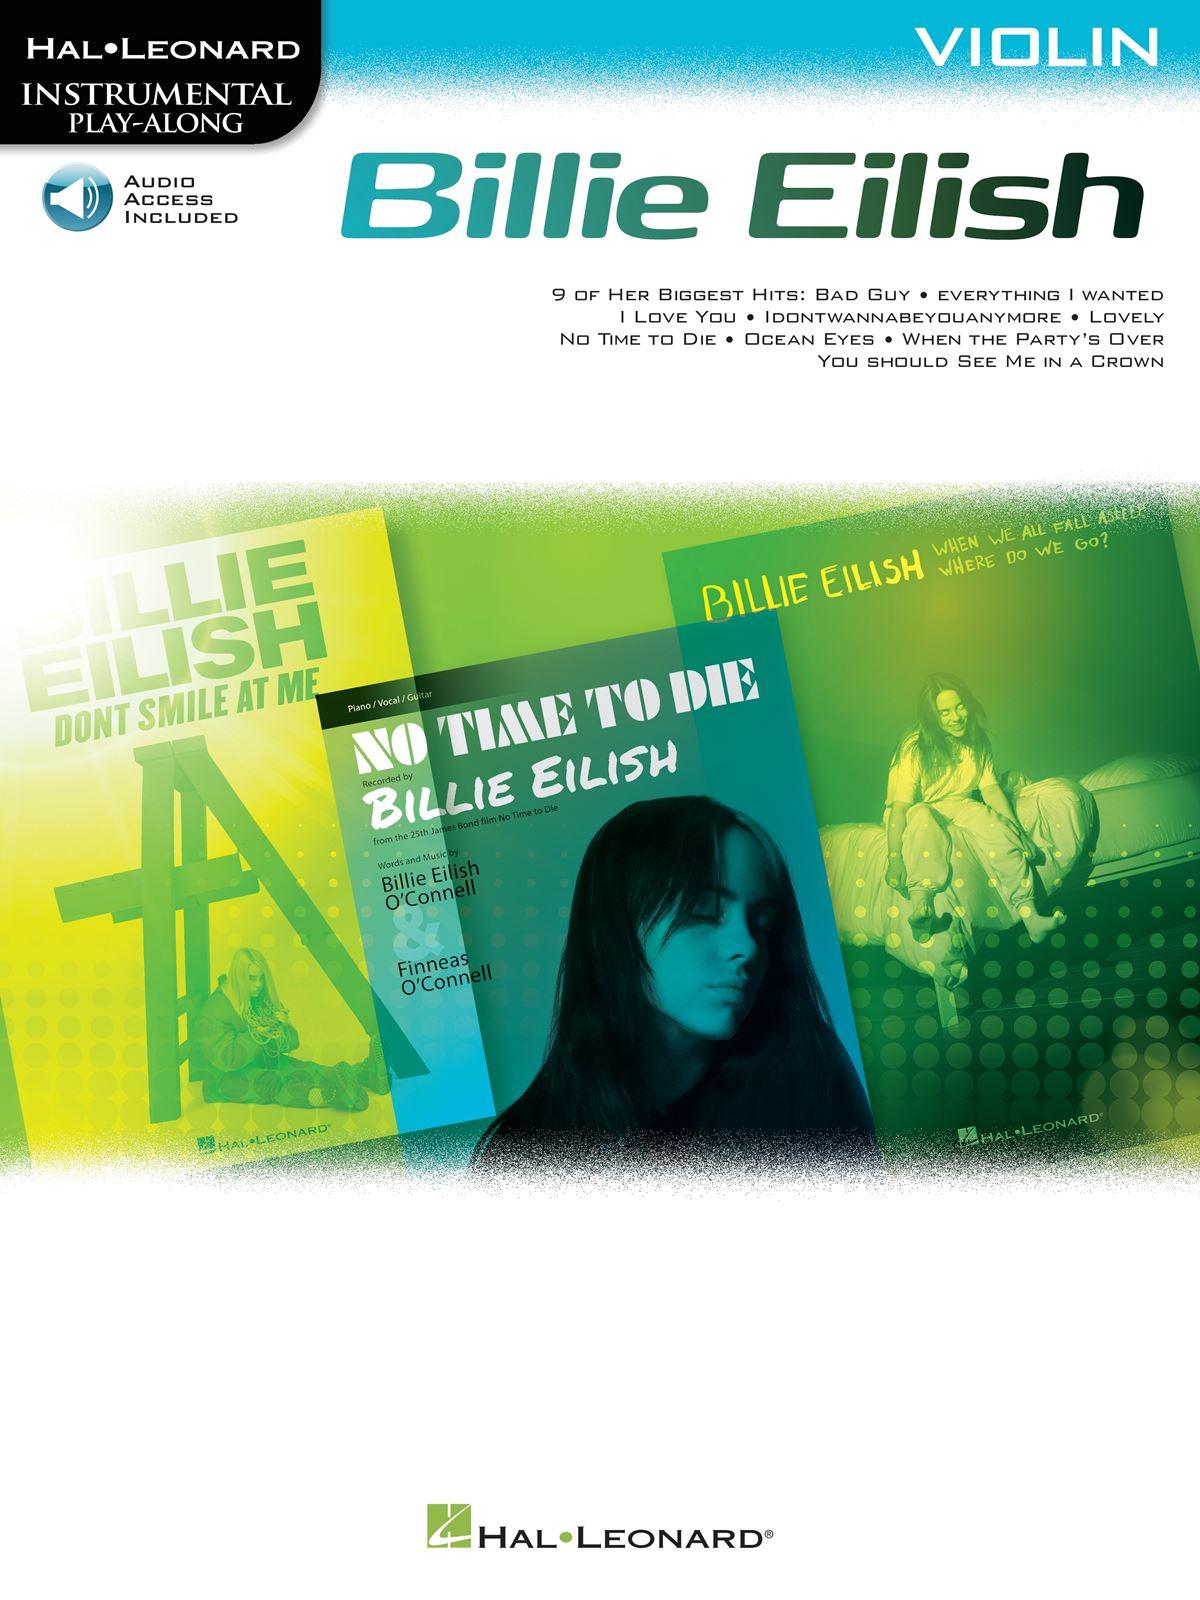 Billie Eilish: Billie Eilish For Violin: Violin Solo: Instrumental Collection